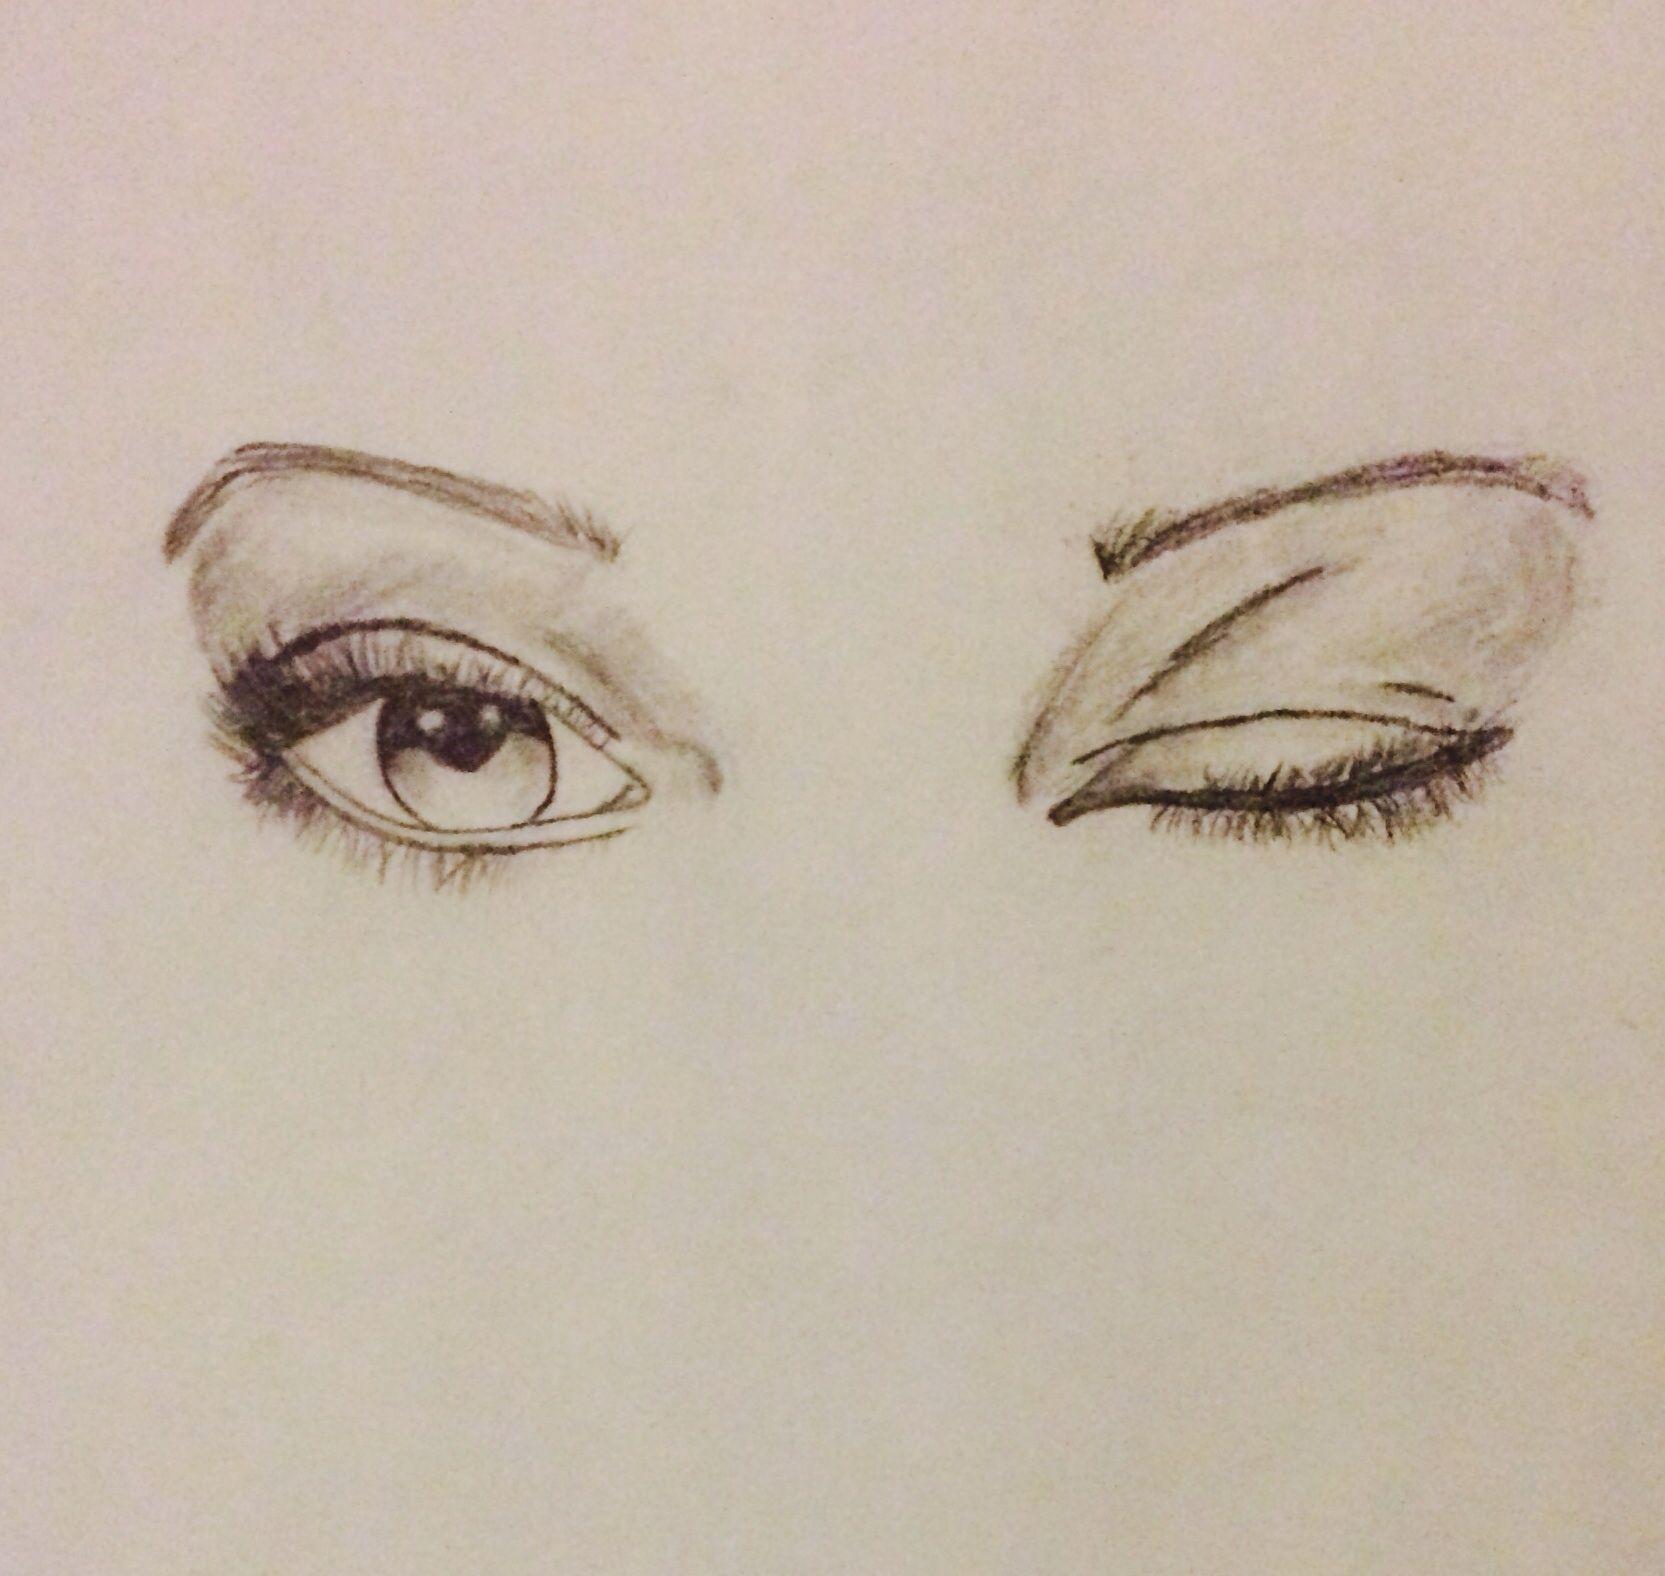 1665x1576 Woman Winking Eye The Window To The Soul Via Artistic